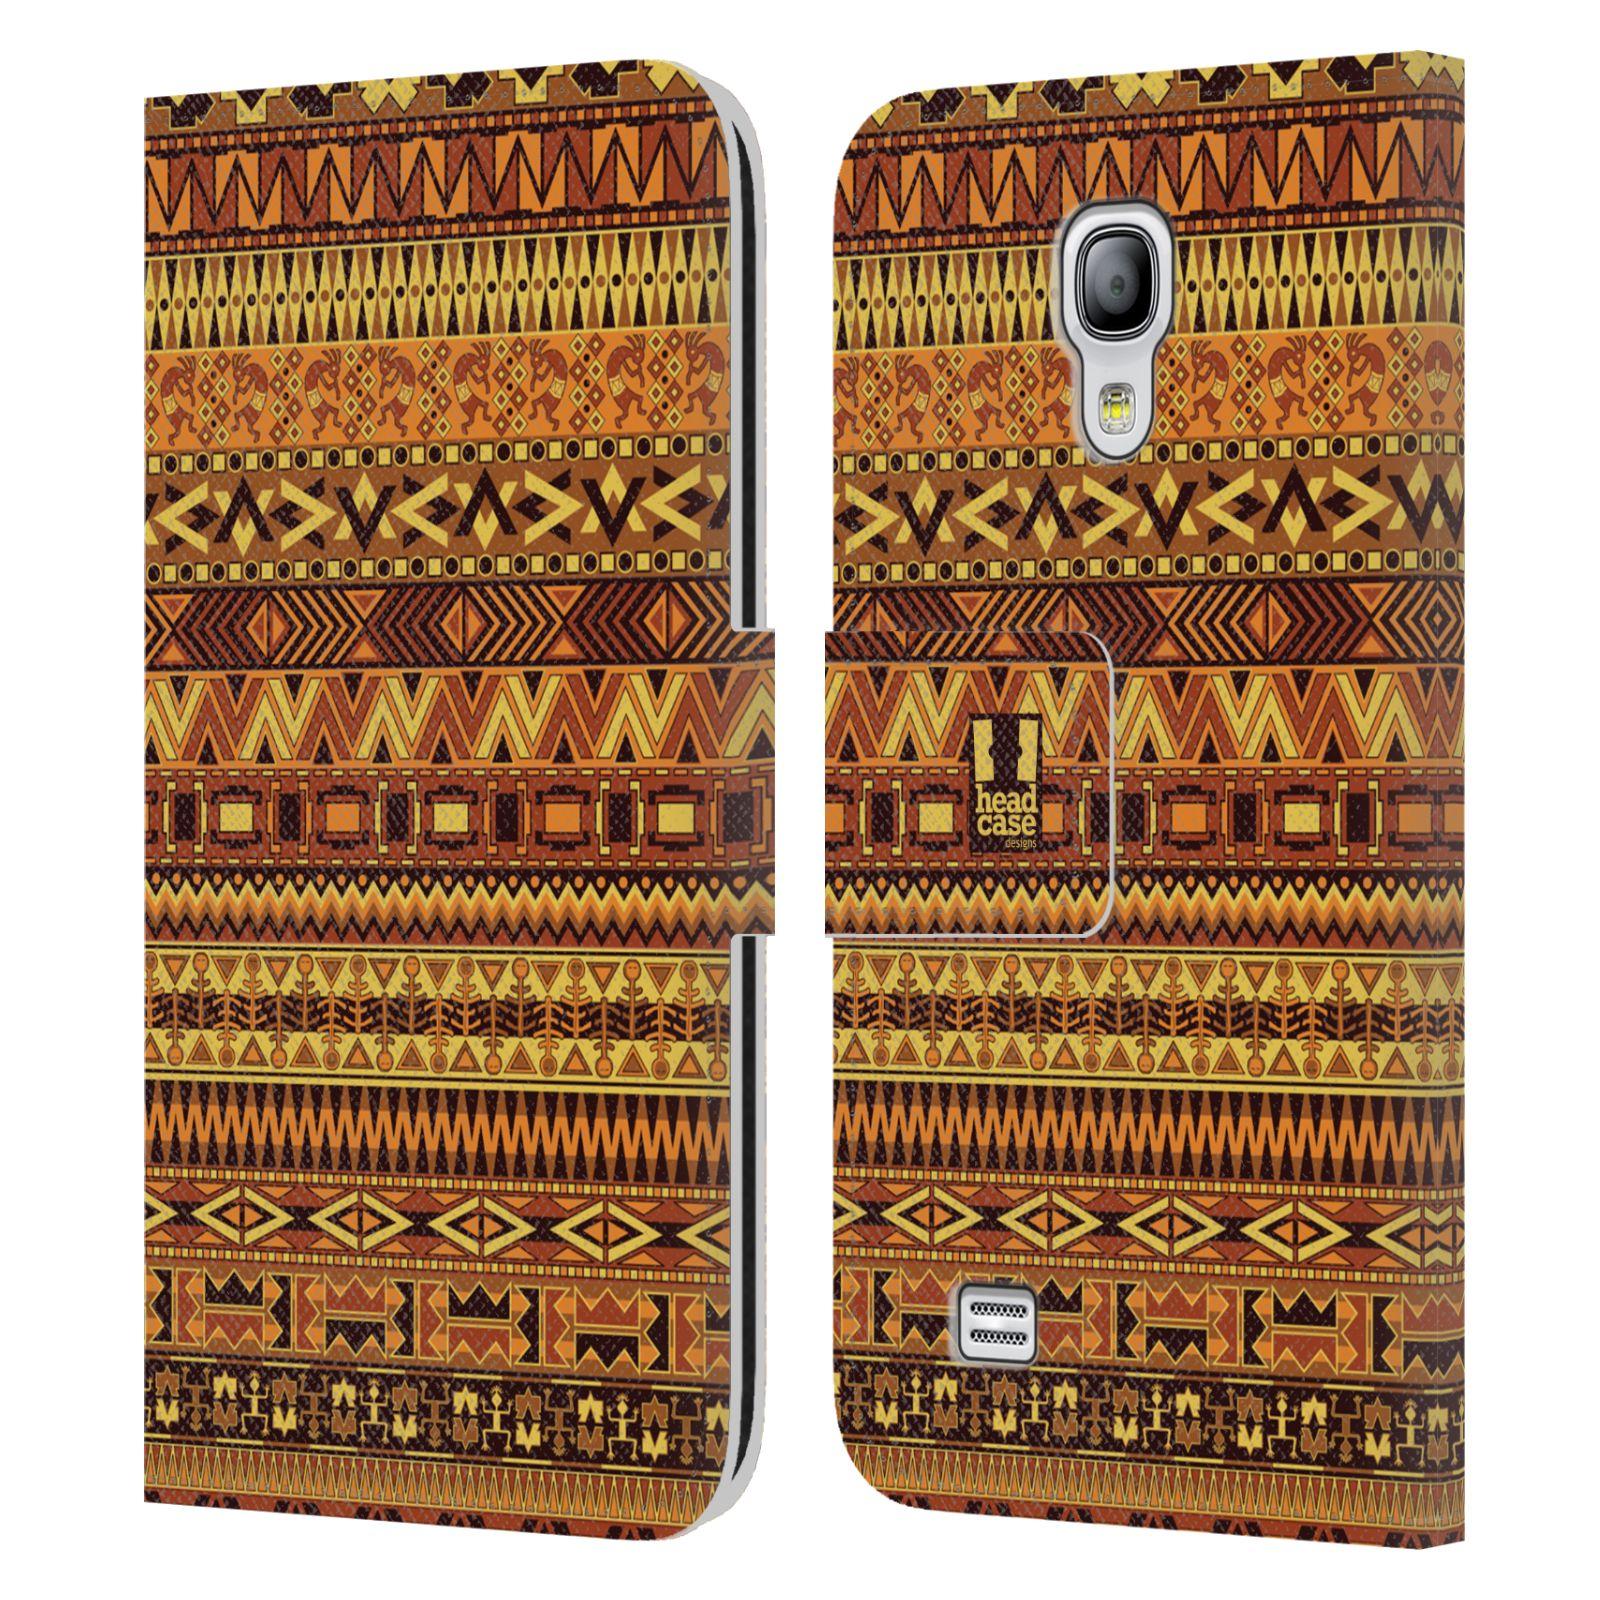 HEAD CASE Flipové pouzdro pro mobil Samsung Galaxy S4 MINI / S4 MINI DUOS Indiánský vzor YELLOW žlutá